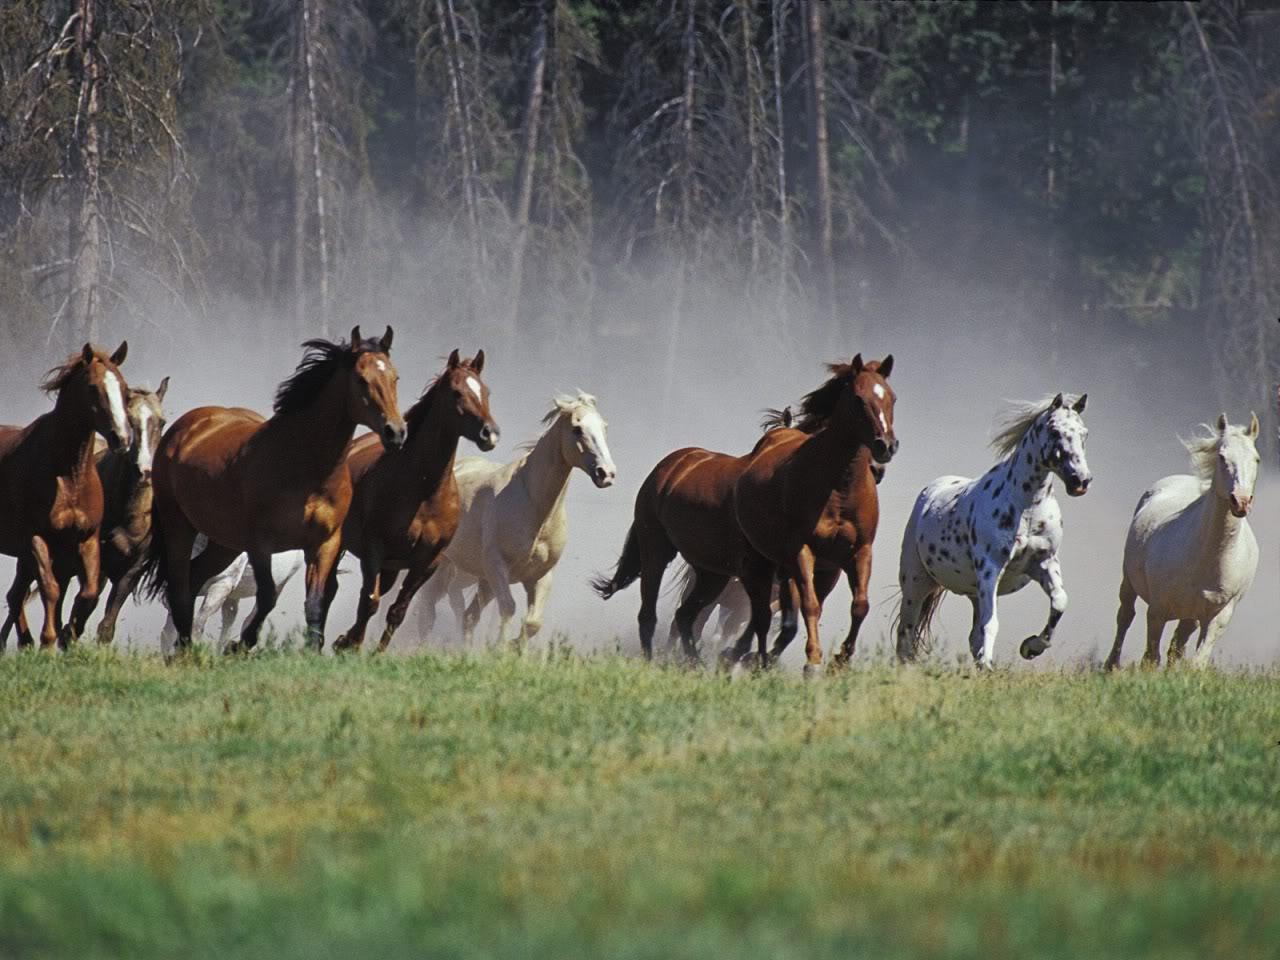 Horse | 馬 | Ngựa Horse-free-wallpaper